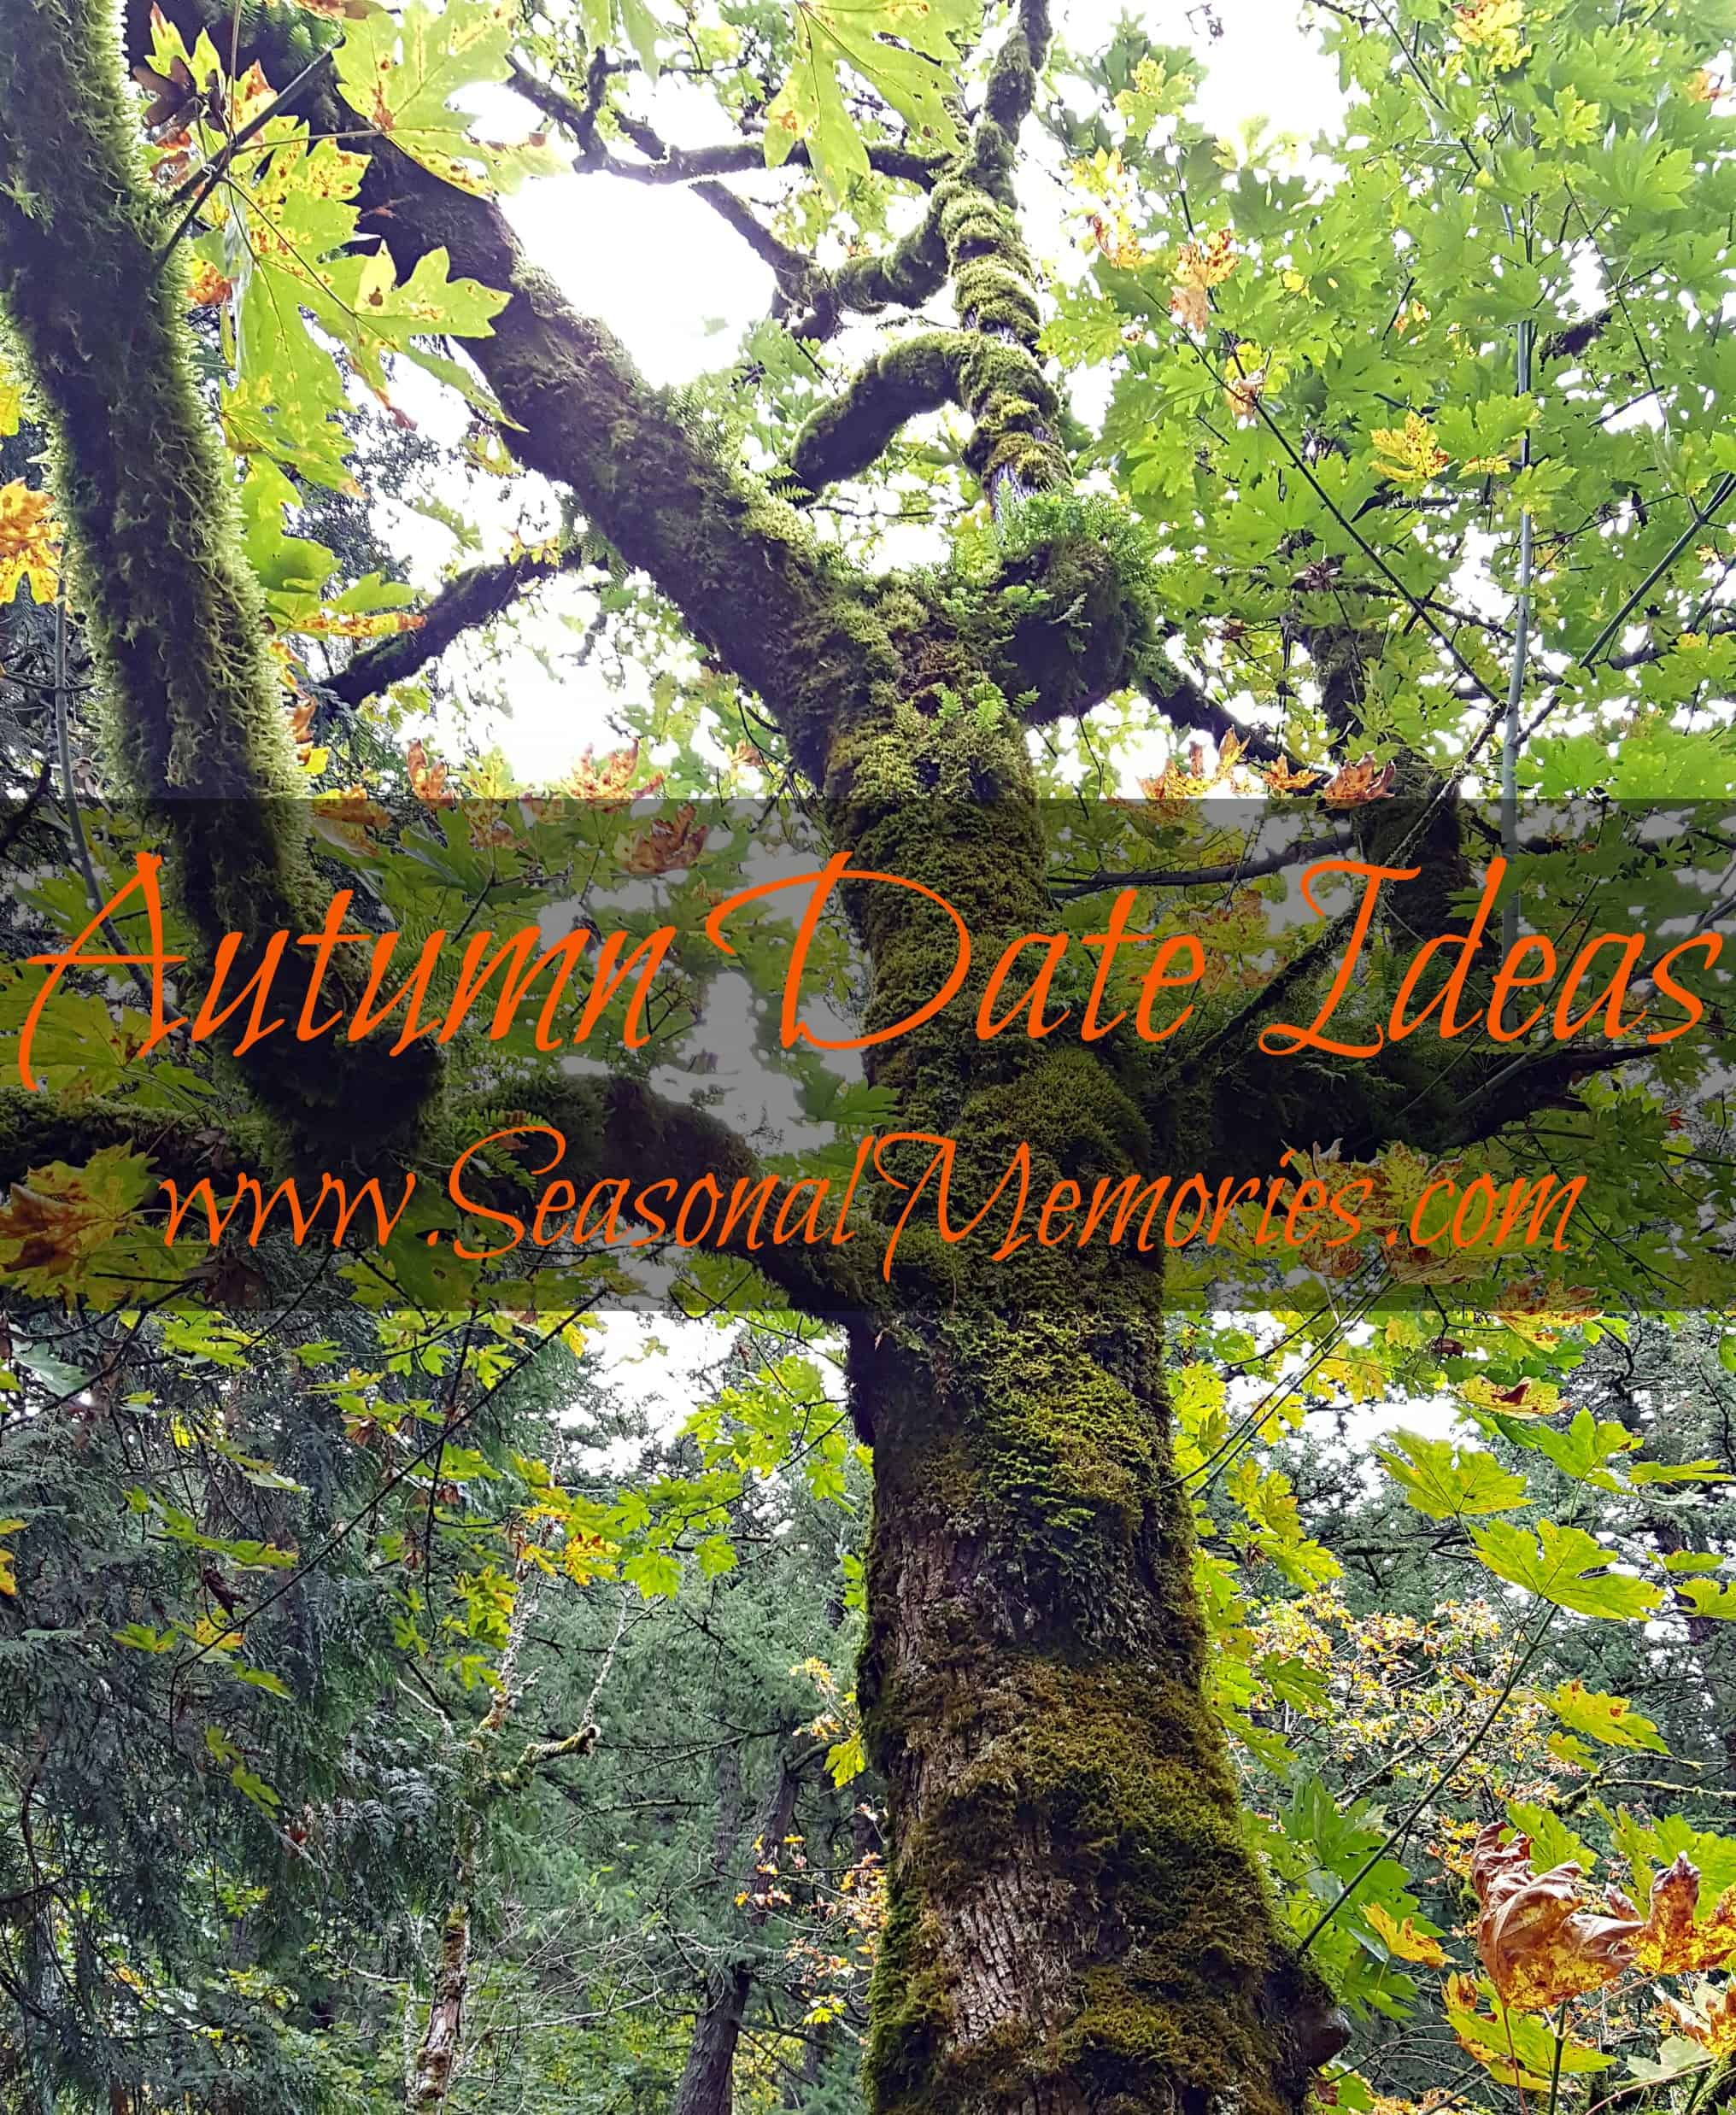 Autumn Date Ideas That Won't Break The Bank